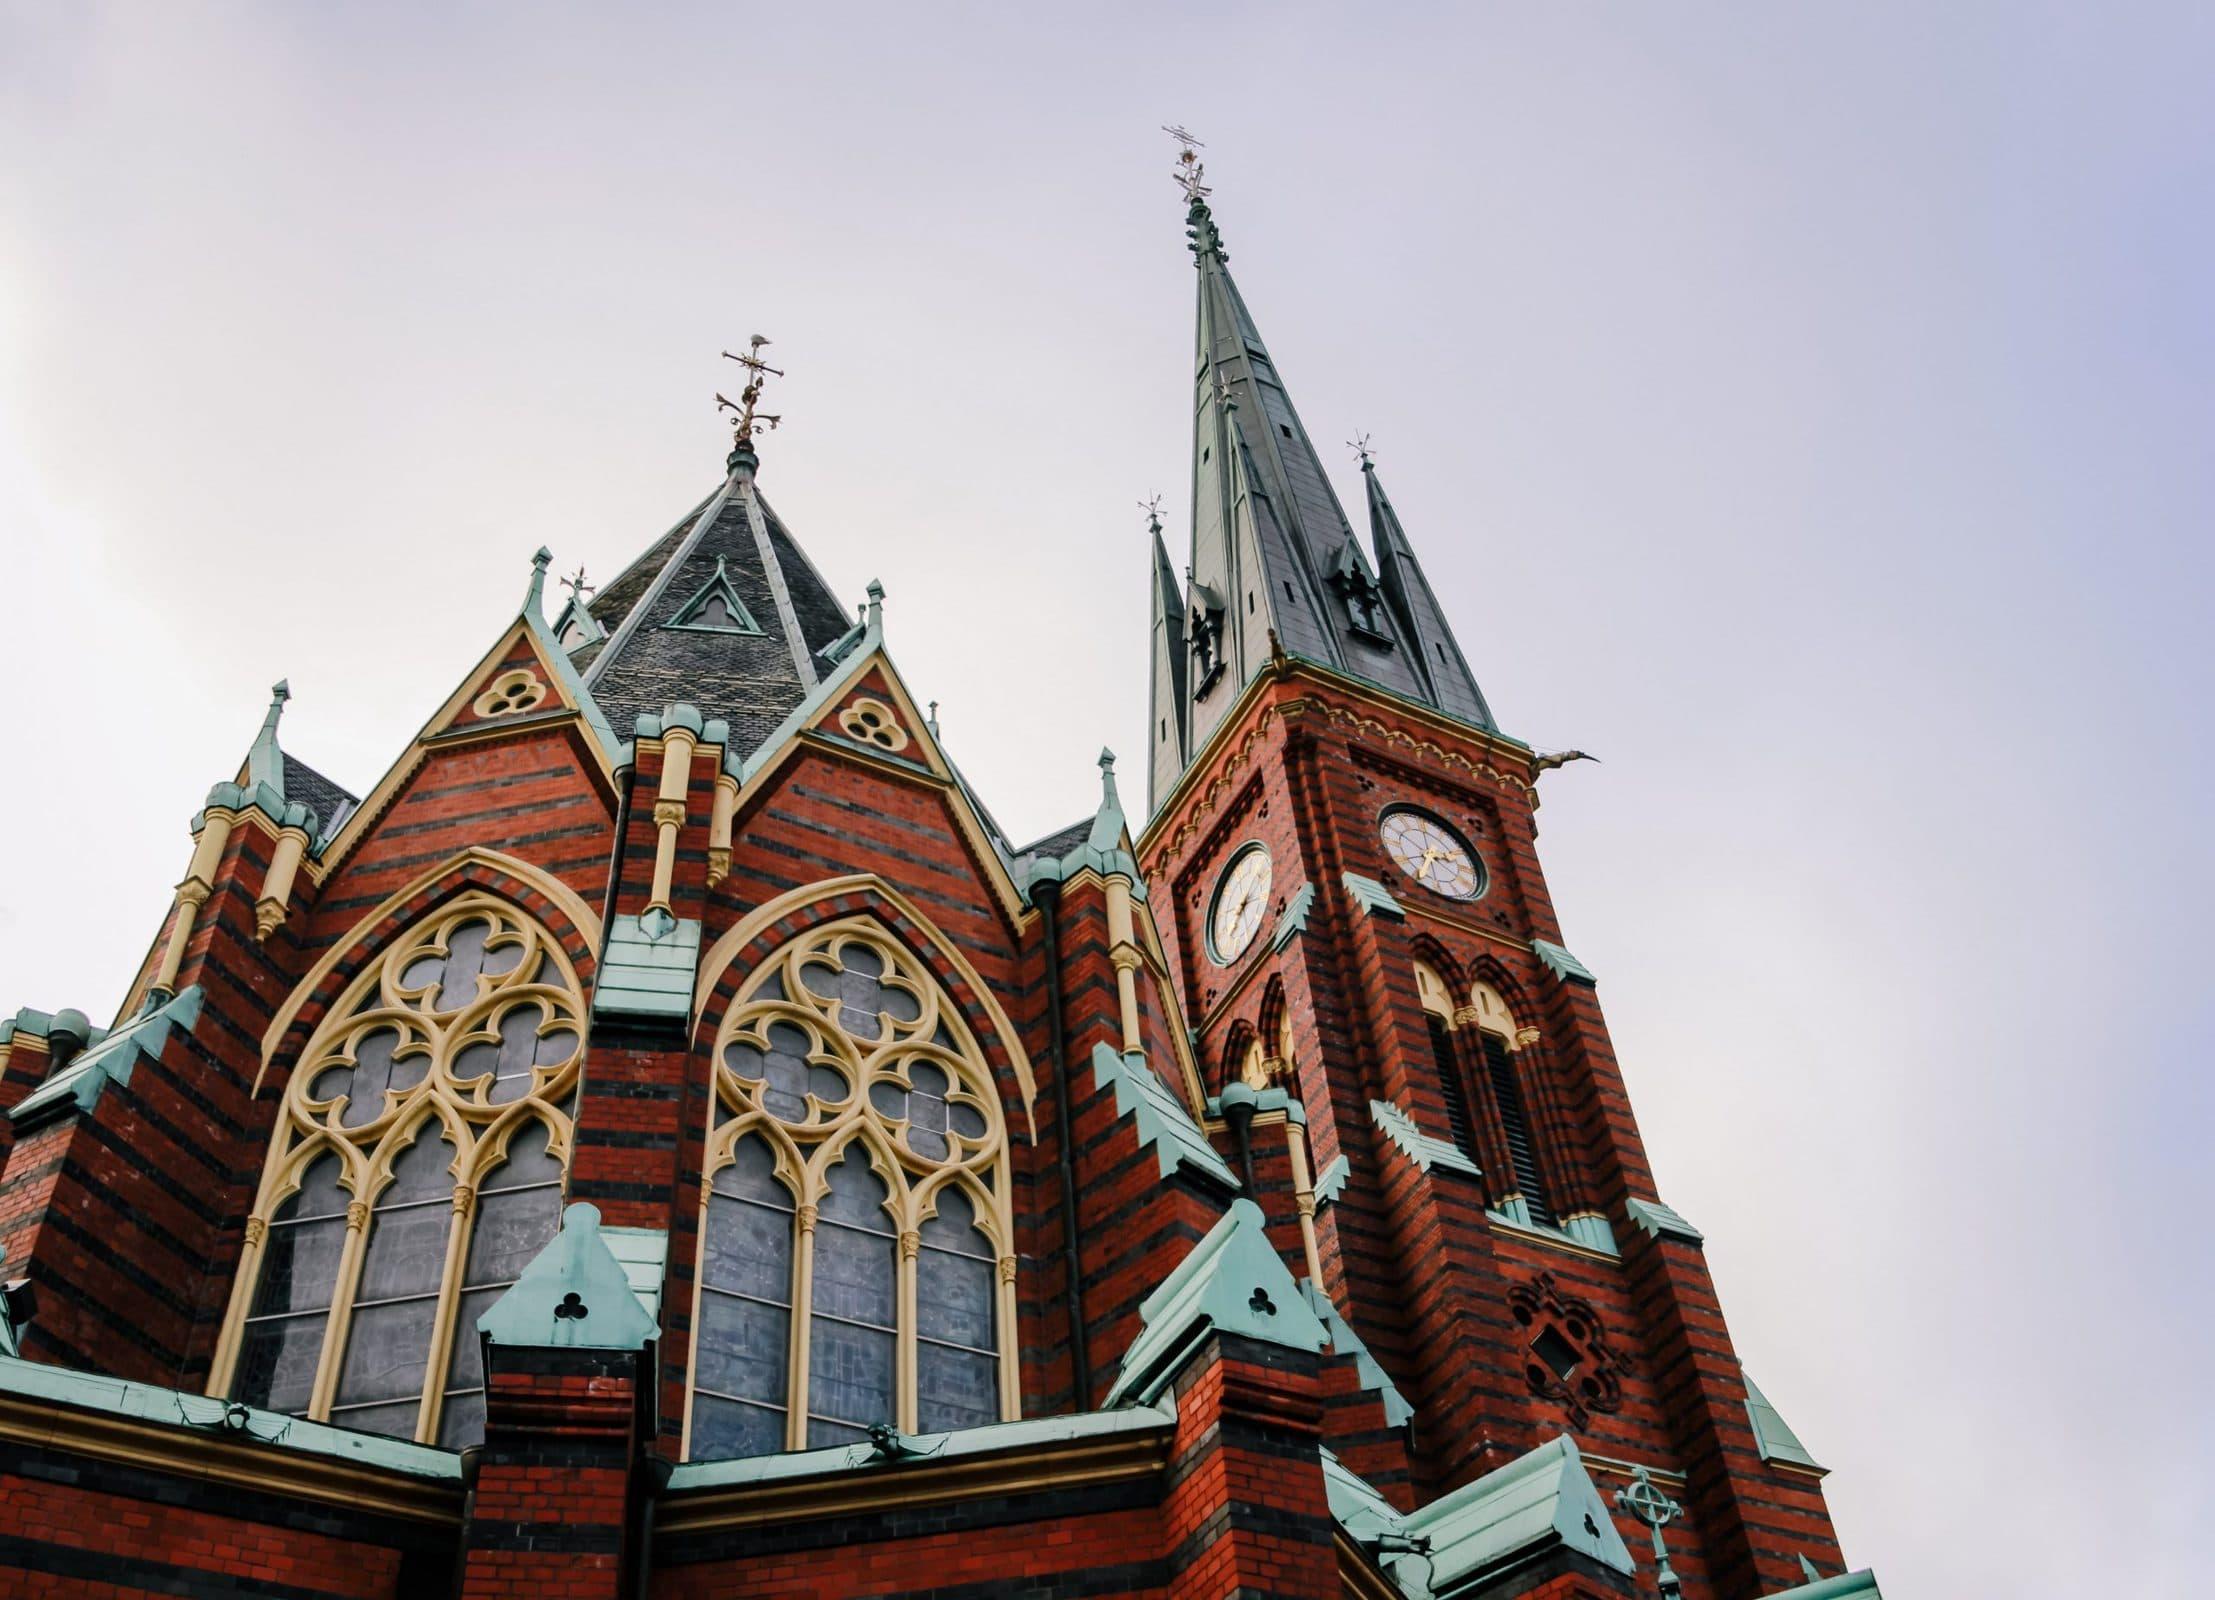 kristijan arsov fjfH5fzG3ds unsplash scaled - Doen in Göteborg: 9 leukste bezienswaardigheden in de Zweedse havenstad